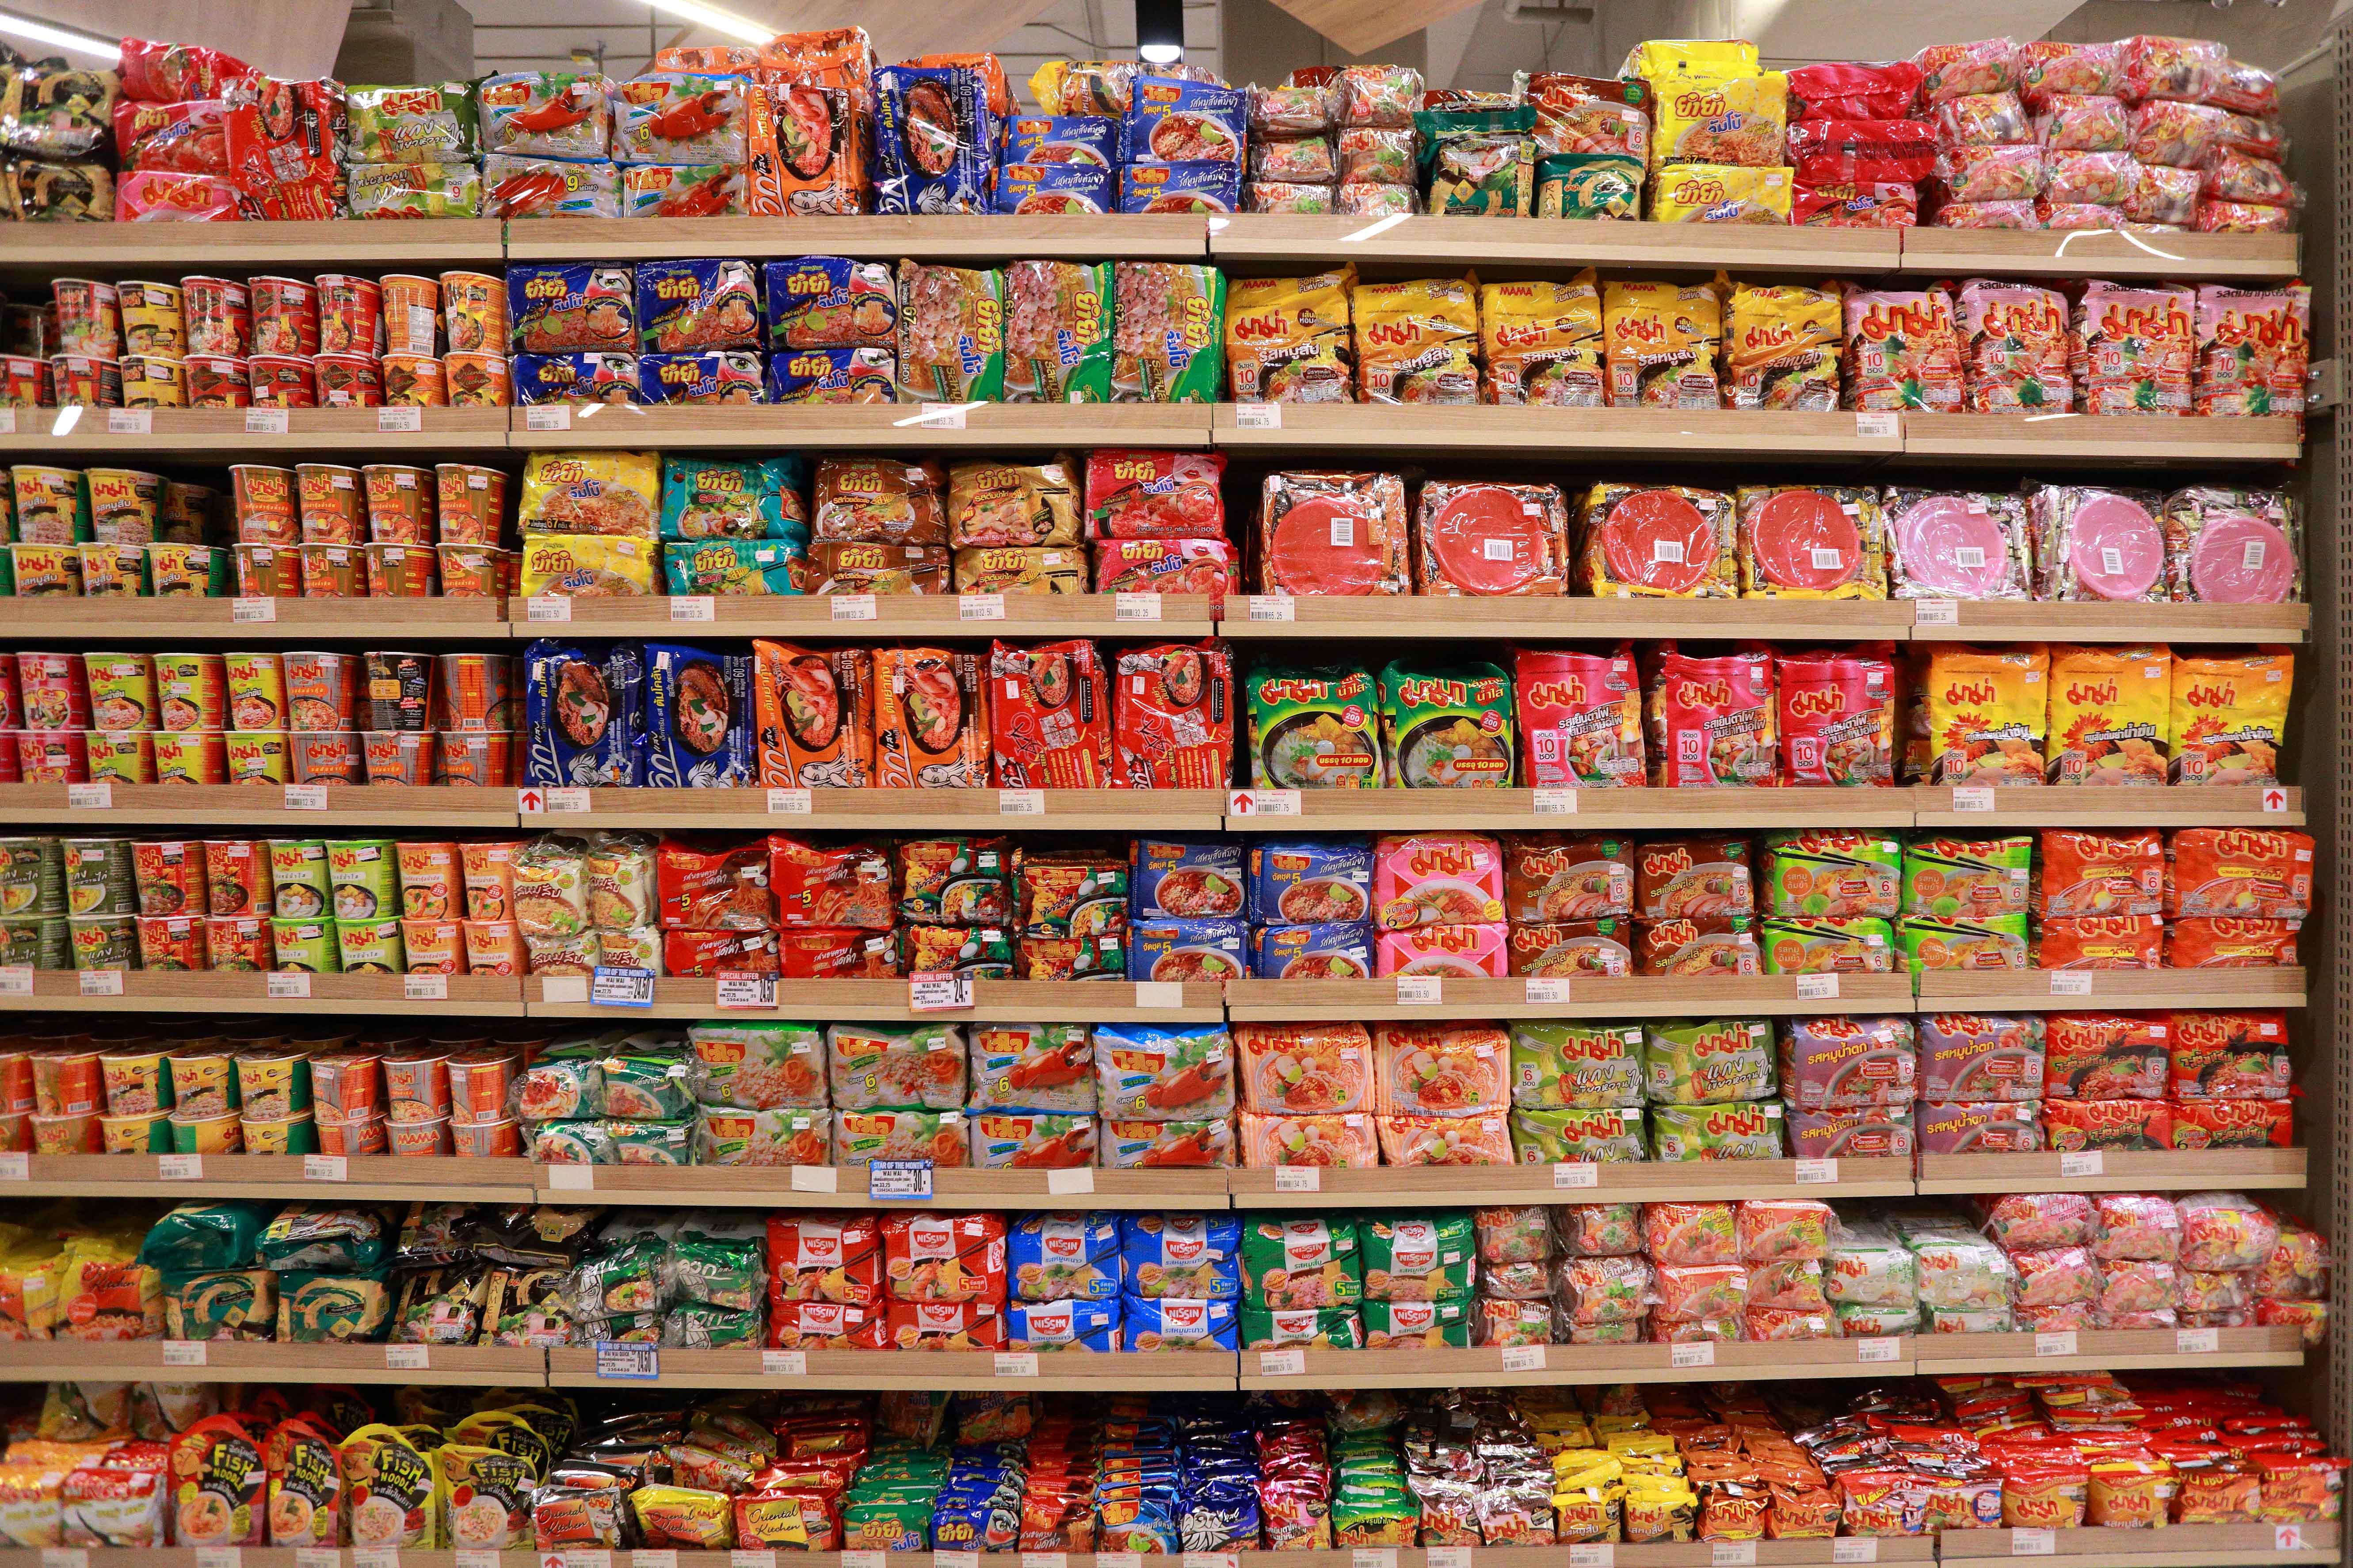 Estanterías de supermercado con multitud de marcas